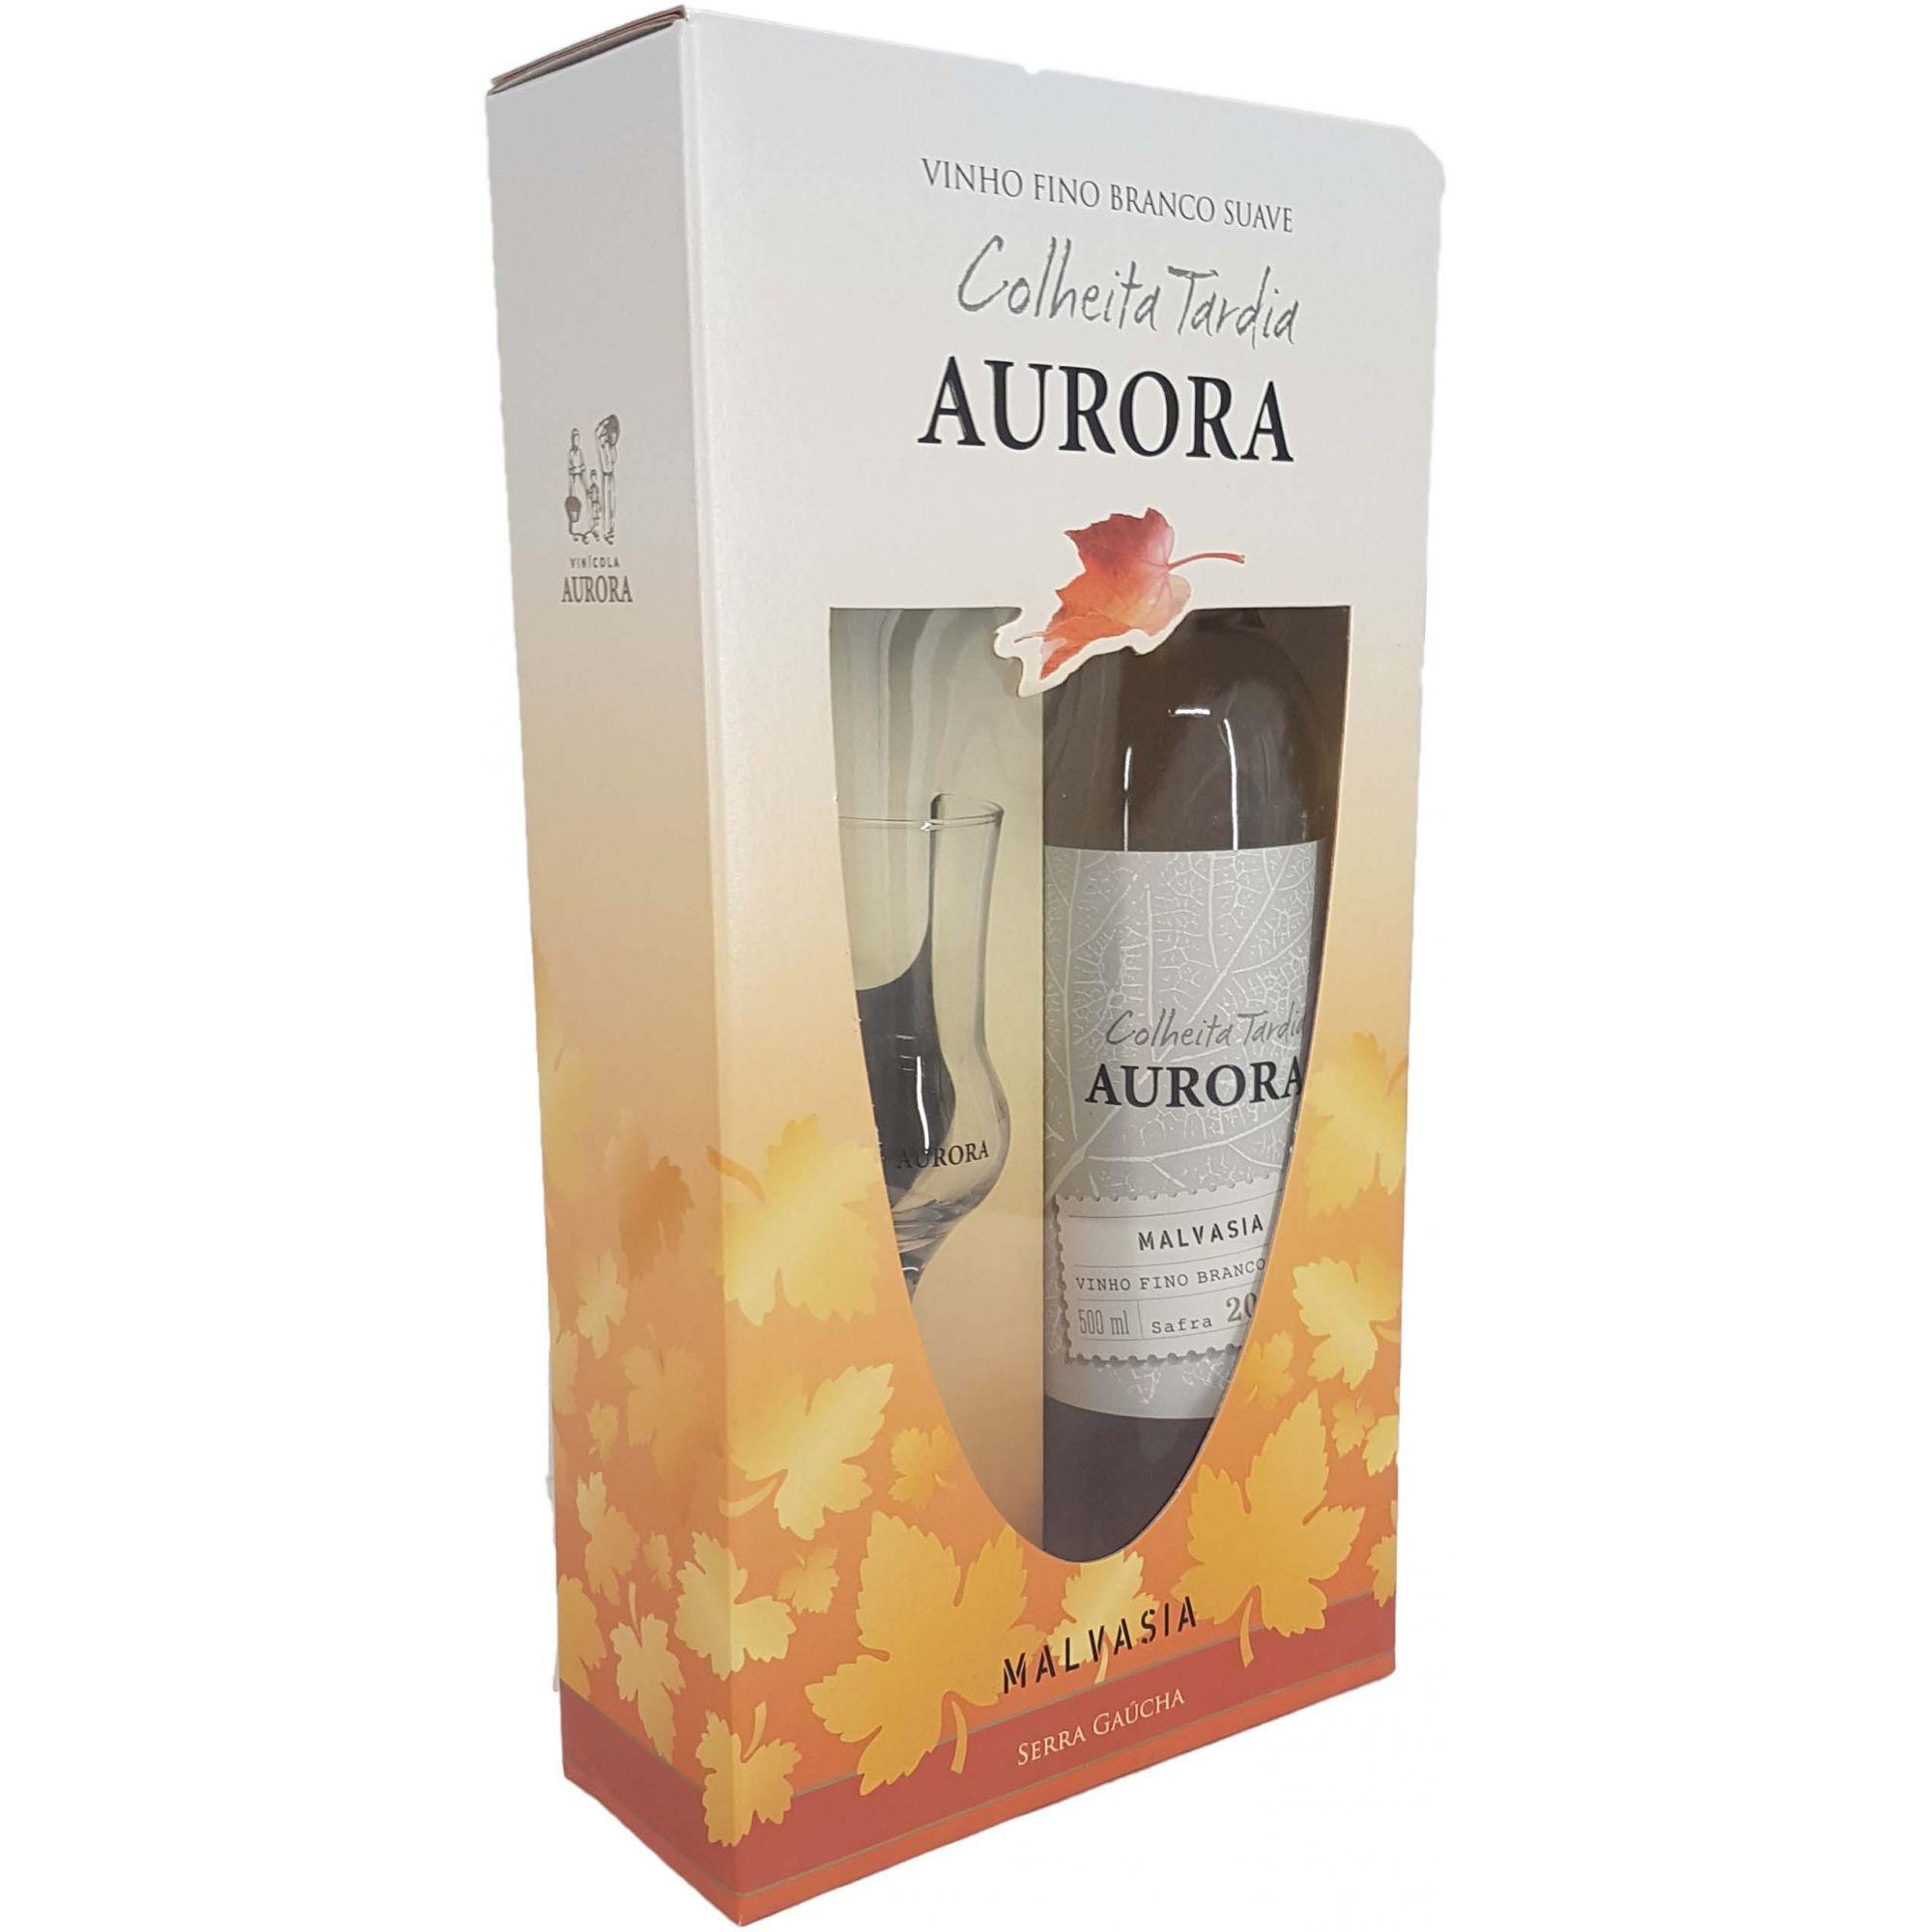 Kit Vinho Branco Aurora Colheita Tardia + 1 Taça - 500ml -